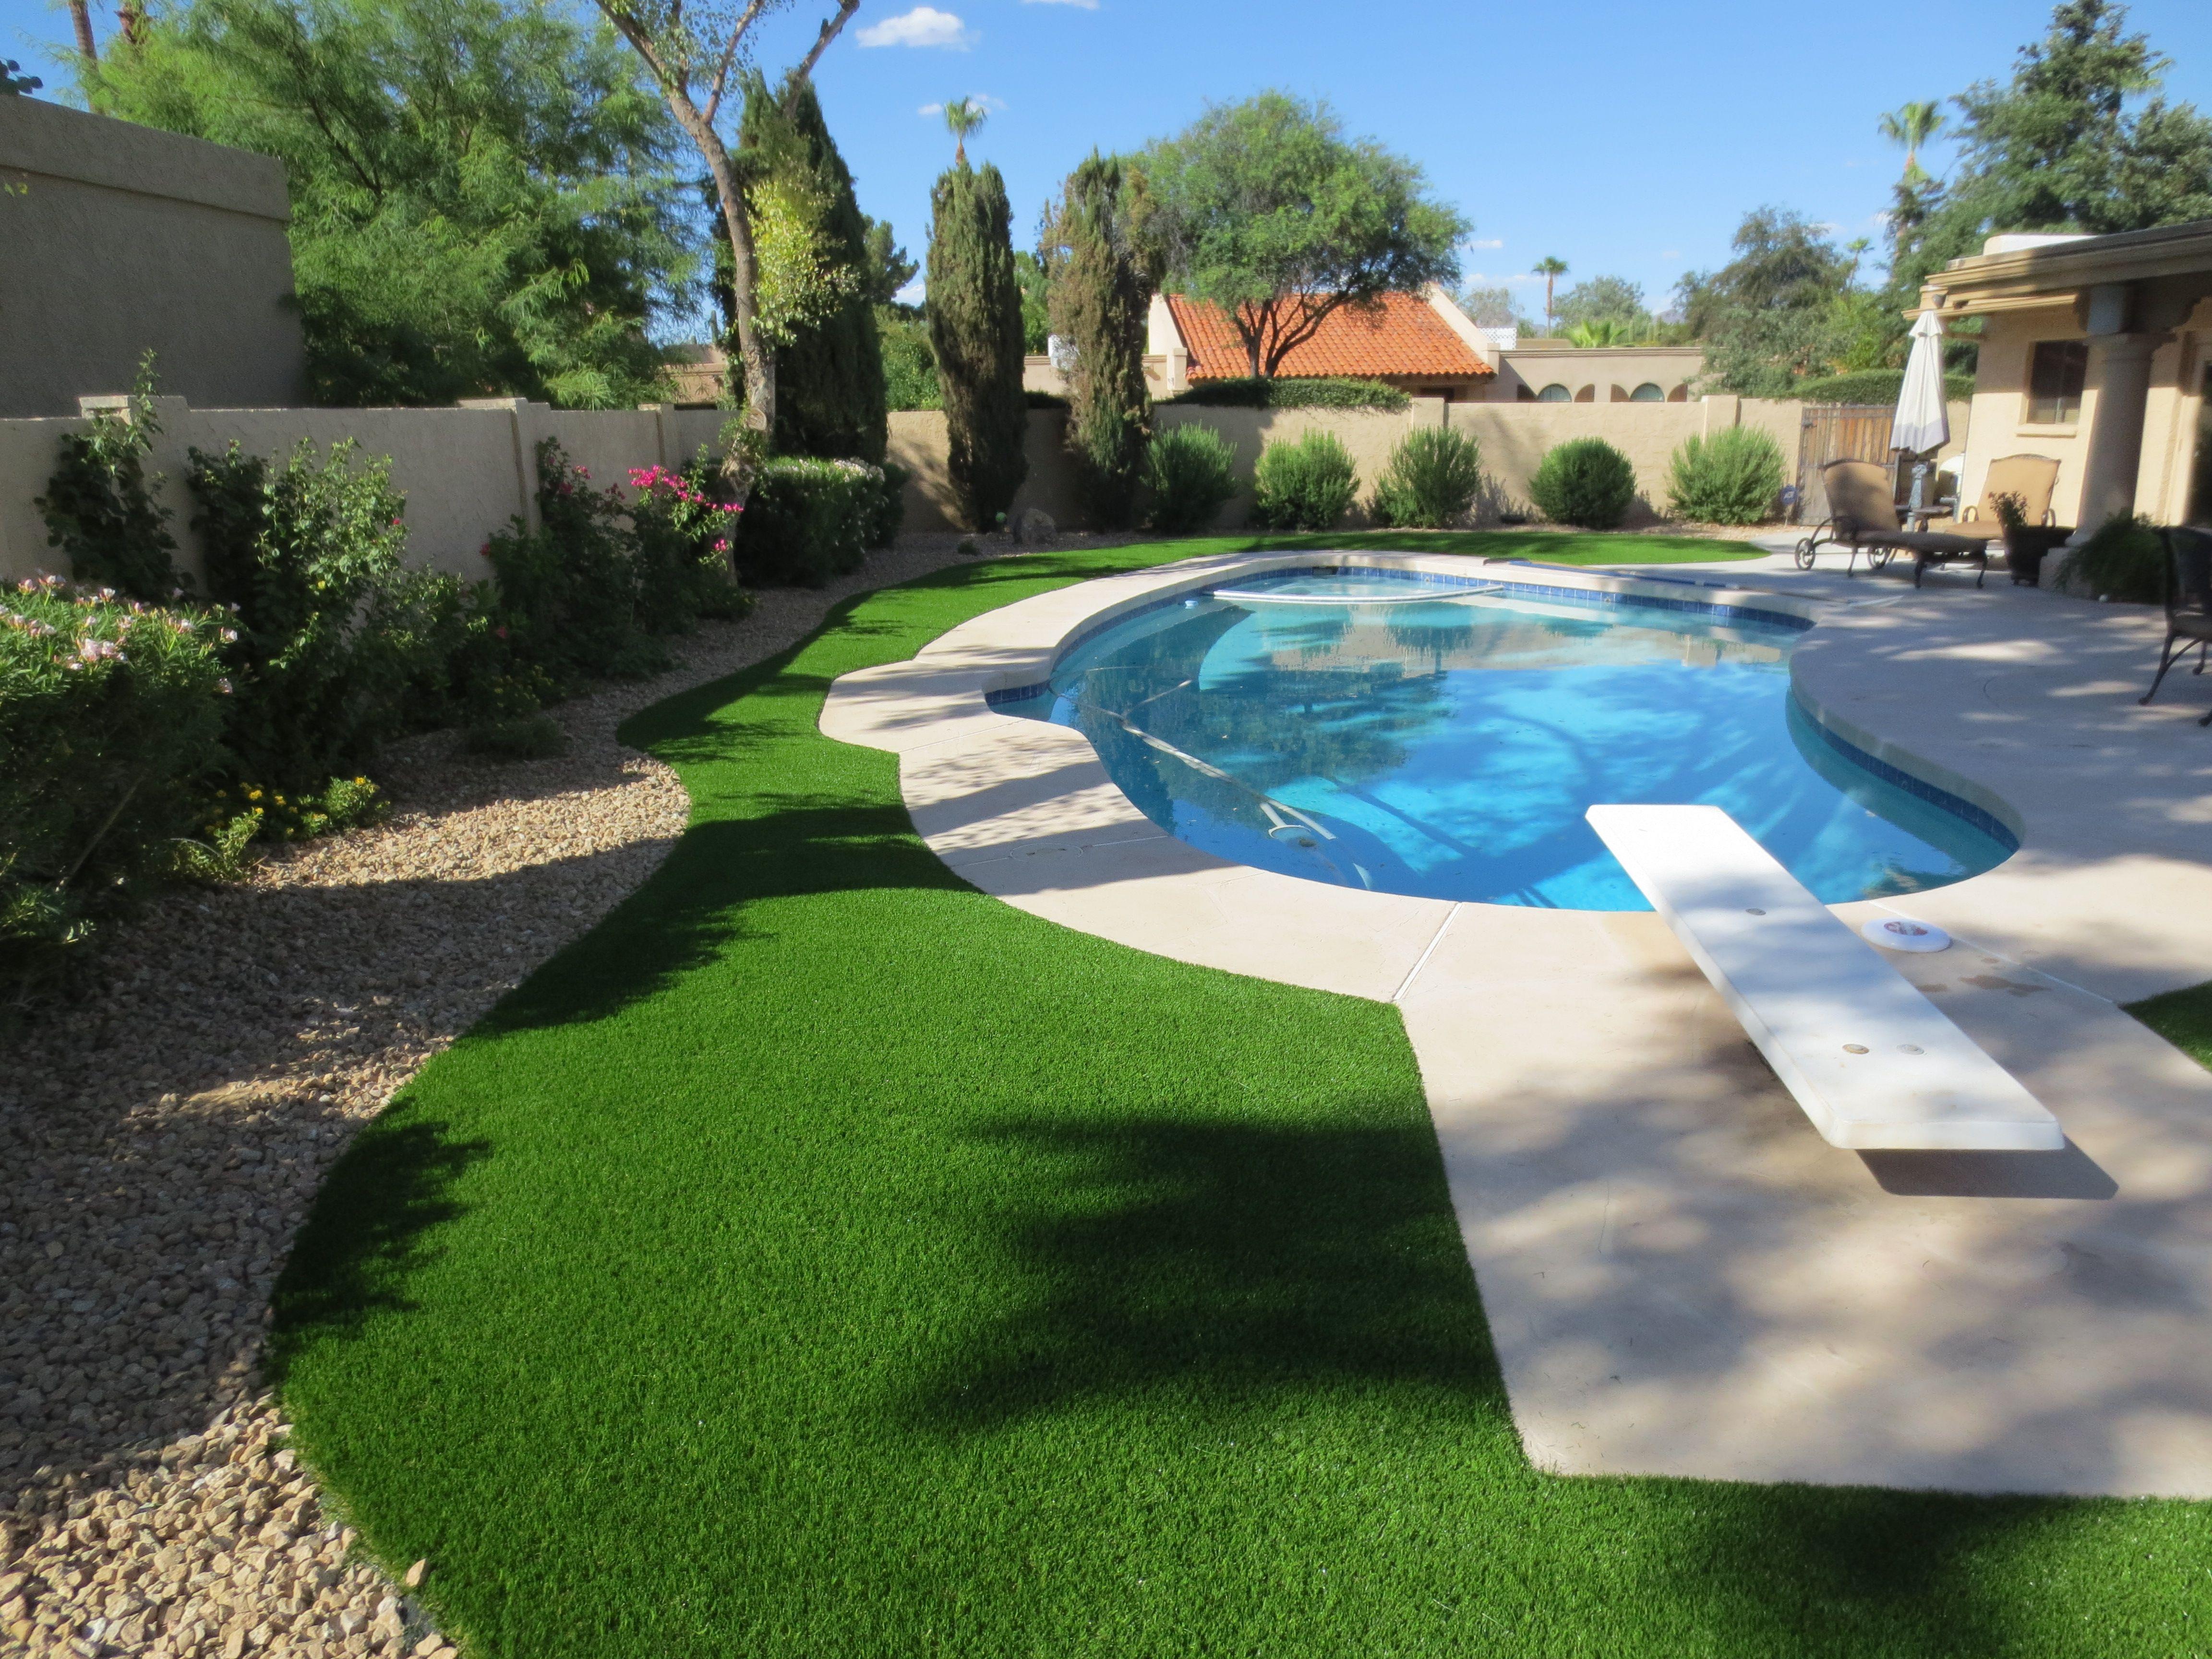 backyard landscaping design using artificial grass free estimate